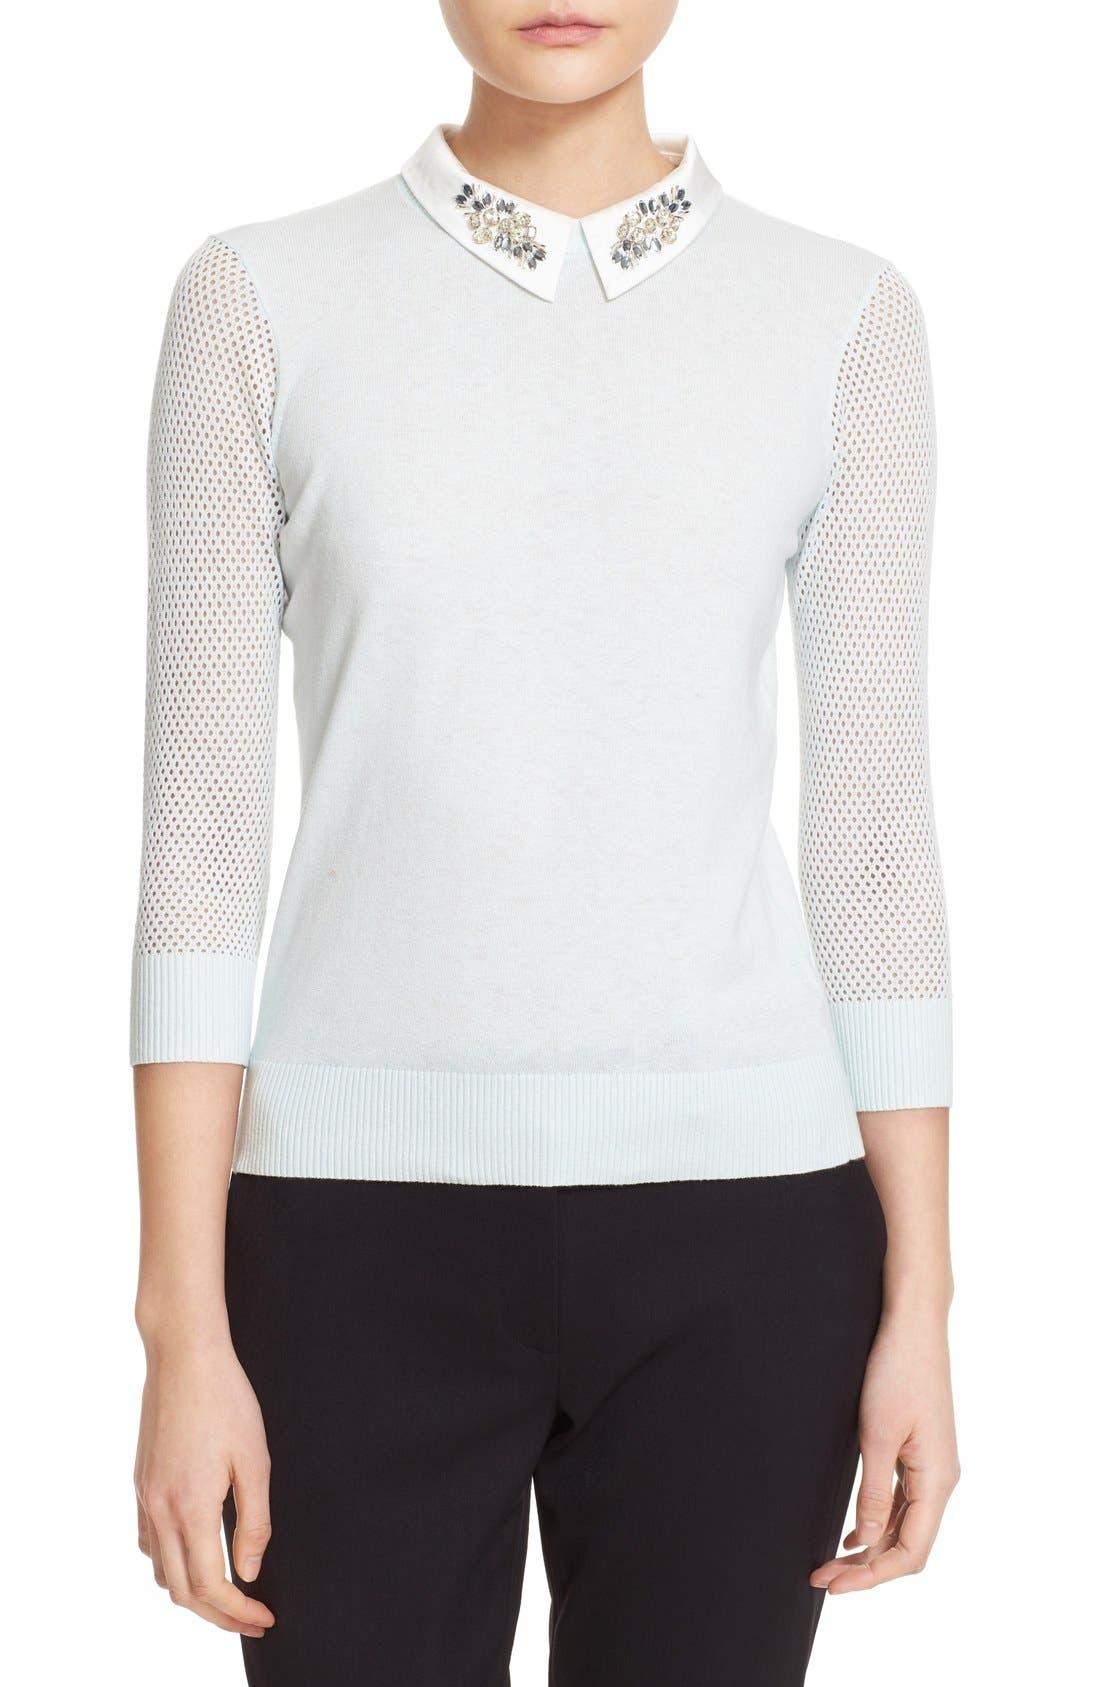 Alternate Image 1 Selected - Ted Baker London Embellished Collar Mesh Sleeve Sweater